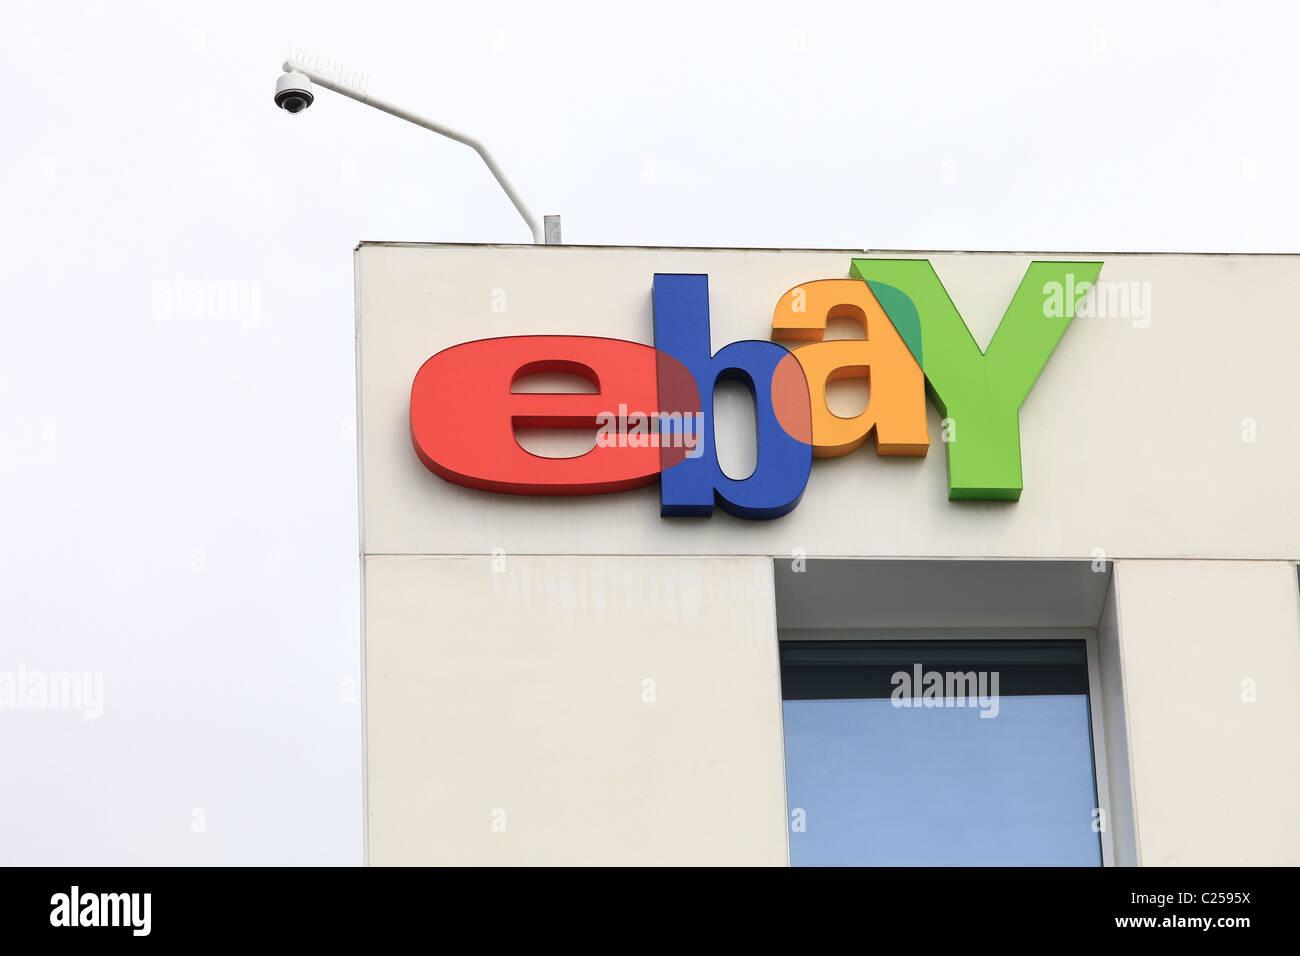 EBAY COMPANY SIGN & LOGO SILICON VALLEY TECH COMPANY 31 March 2011 - Stock Image